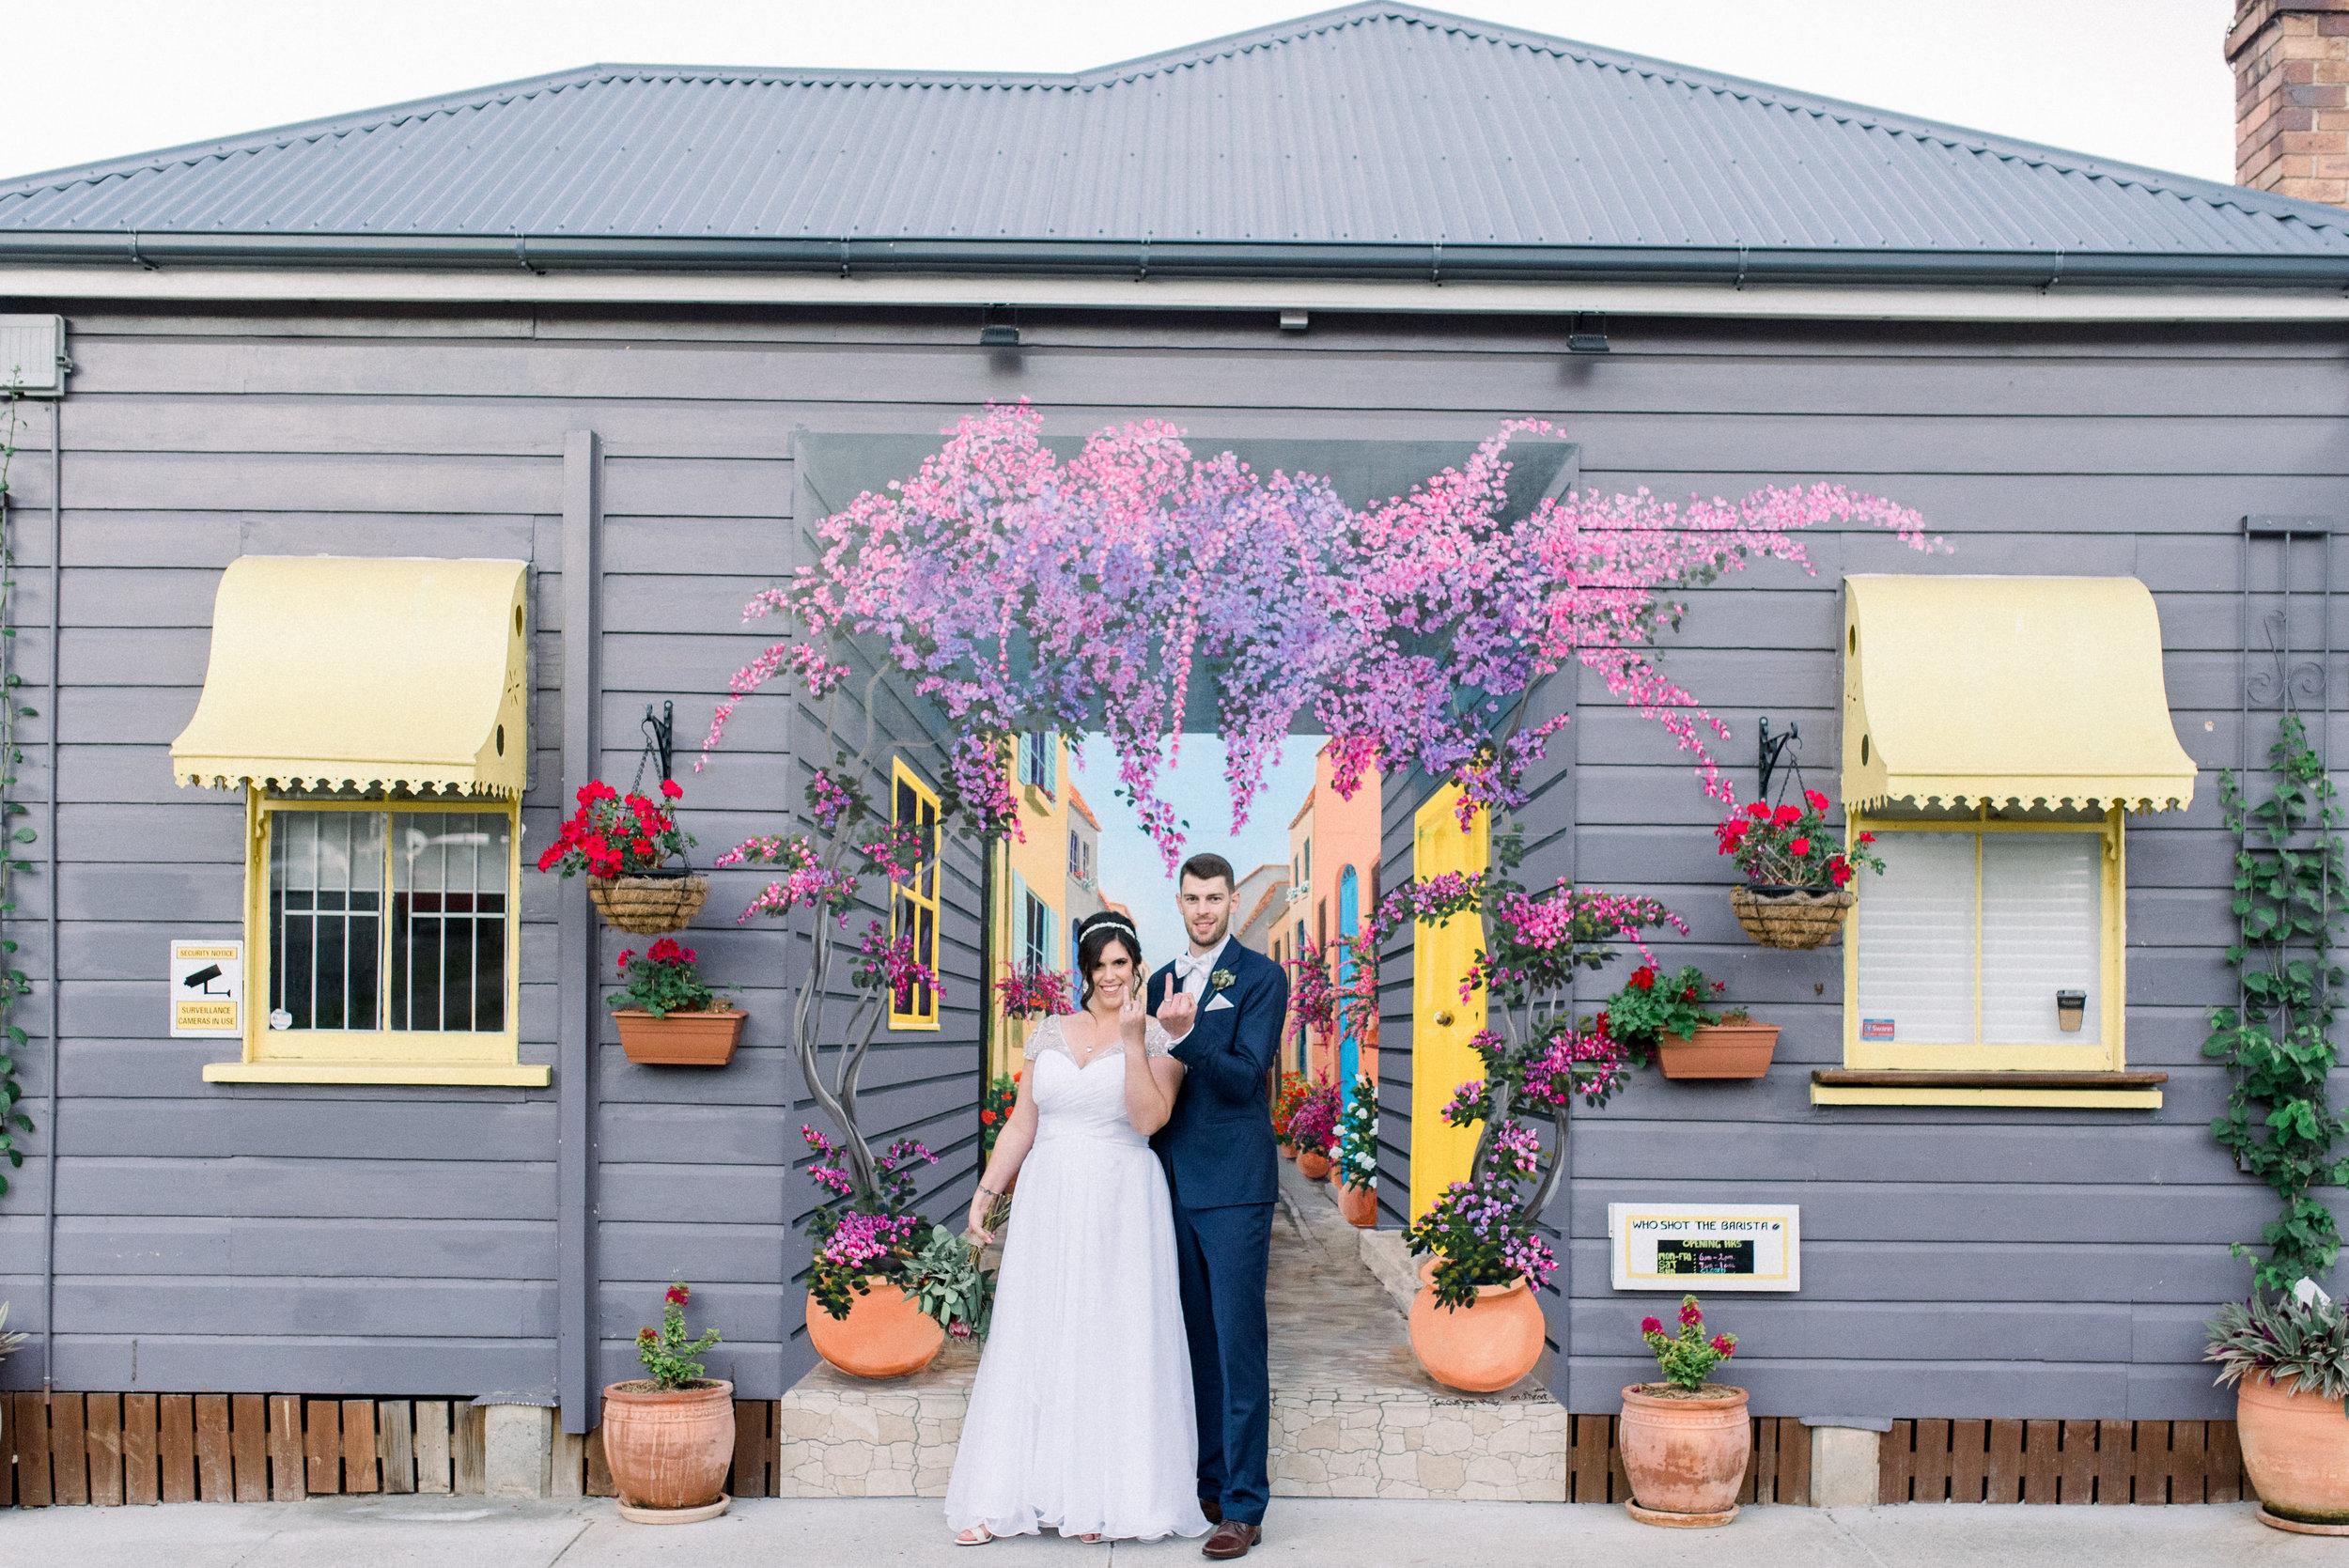 brisbane-city-wedding-photography-film-light-loft-westend-1-24.jpg